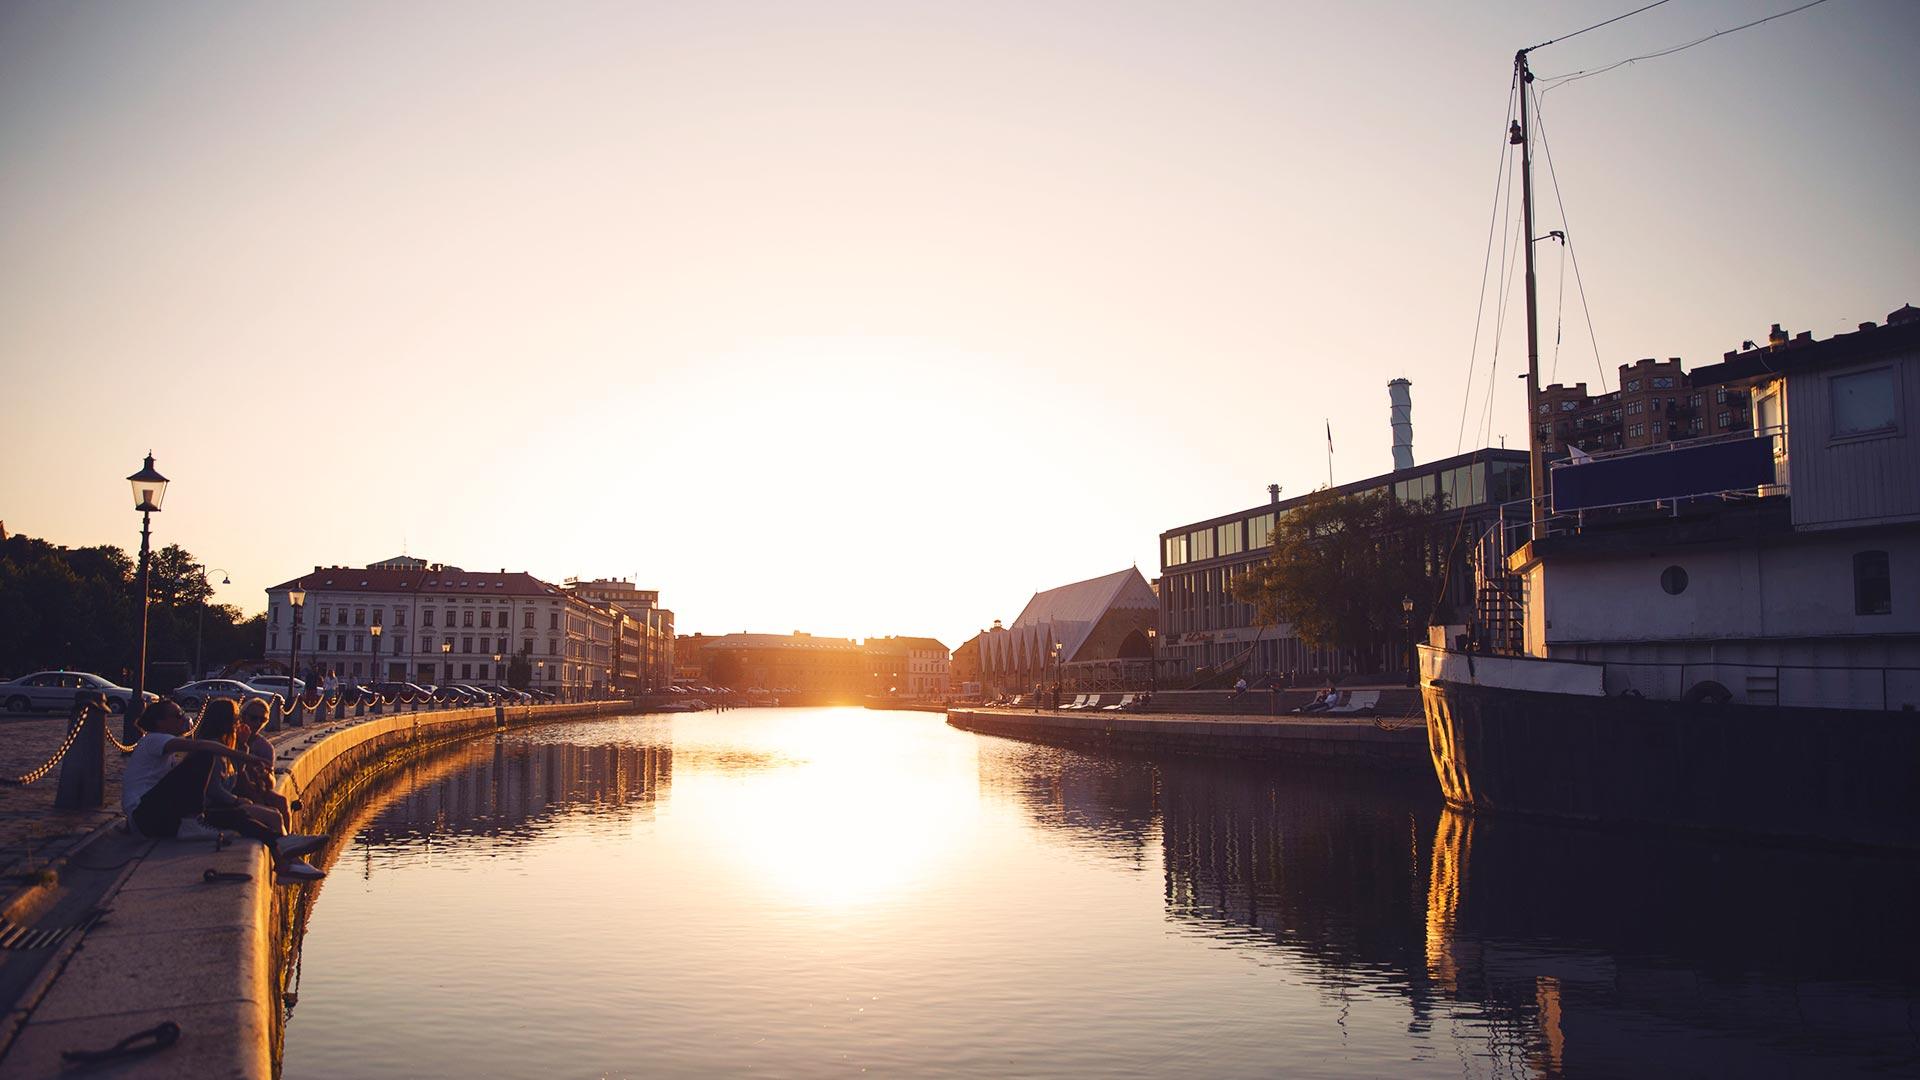 Sonnenuntergang in Göteborg